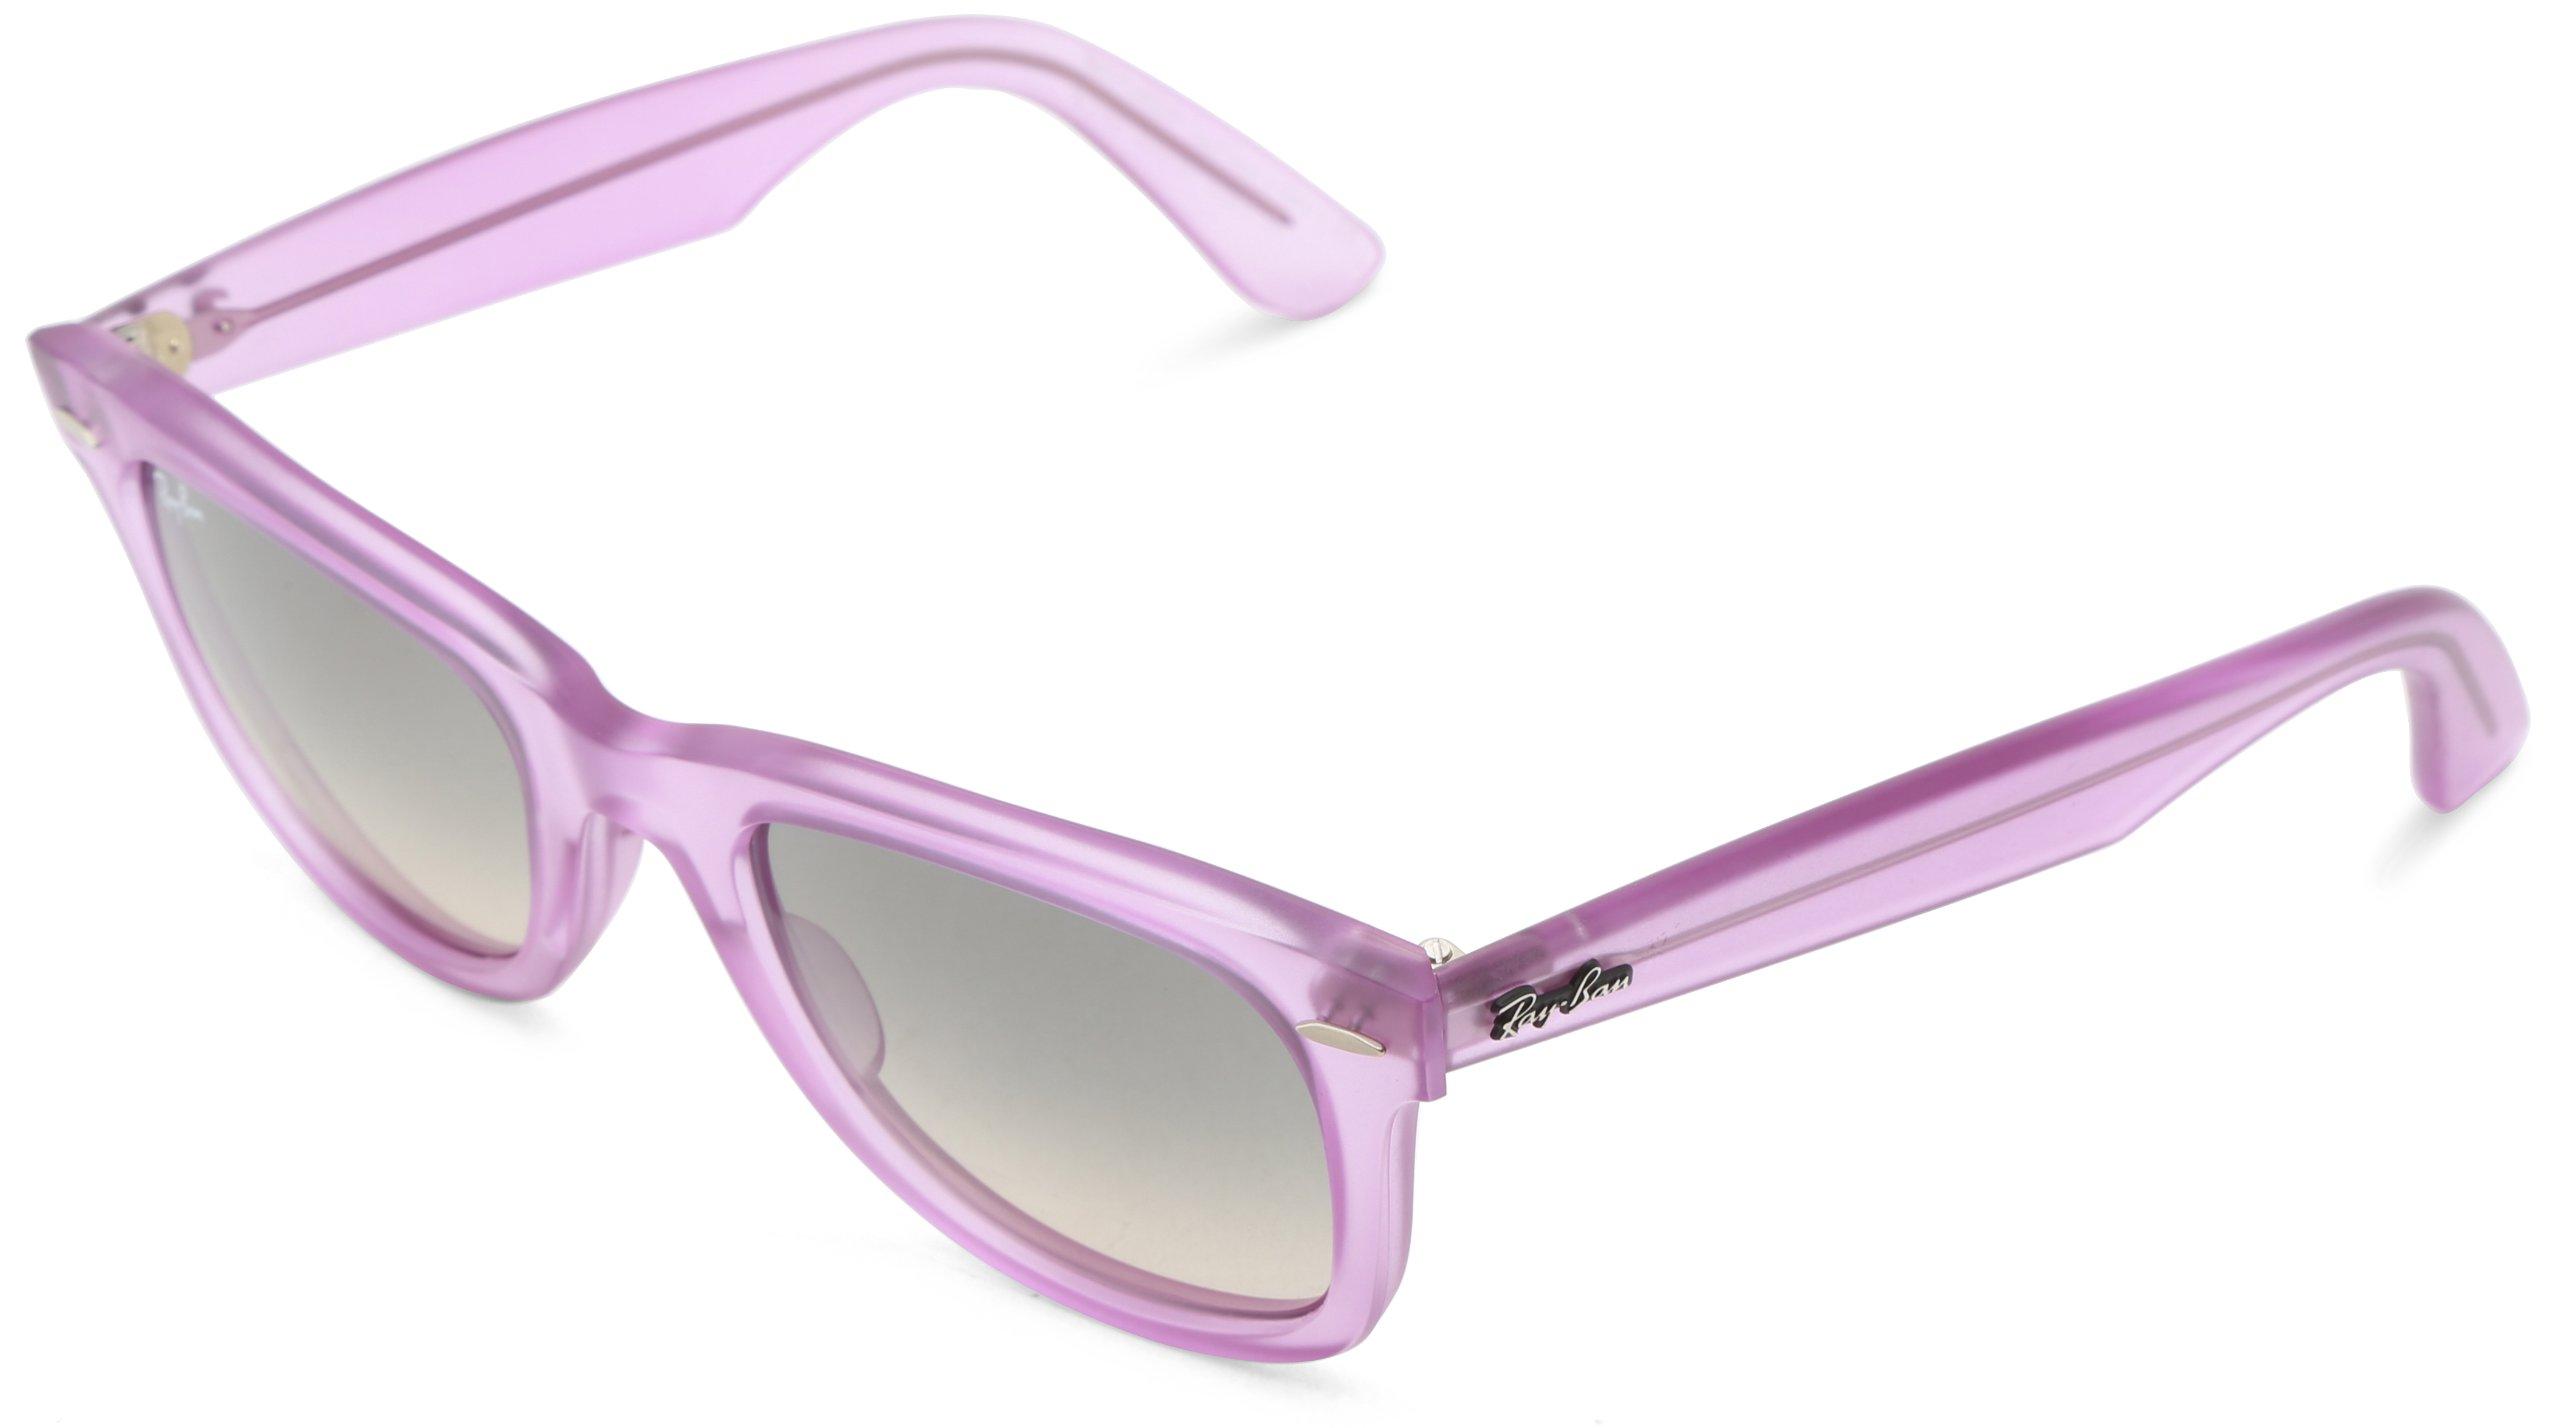 Ray-Ban 0RB2140 Original Wayfarer Sunglasses, Demi Gloss Violet, 50mm